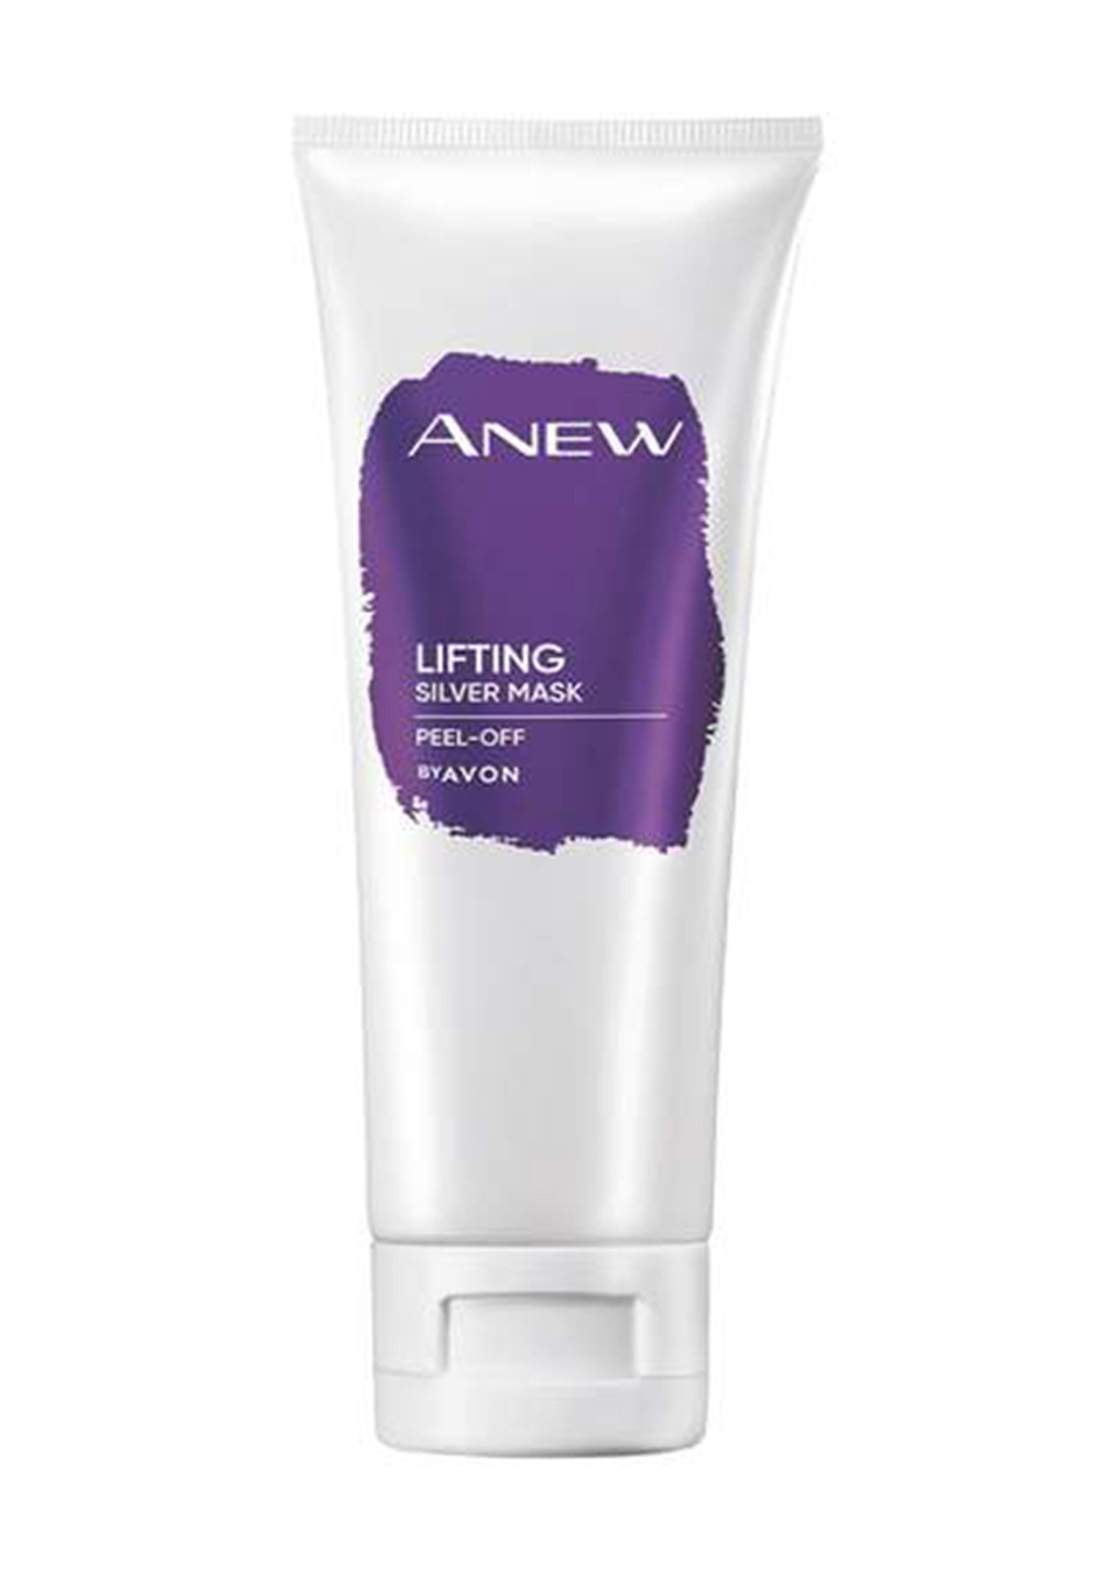 Avon 1223212 Anew Platinum Lifting Silver Mask 75 Ml قناع للبشرة